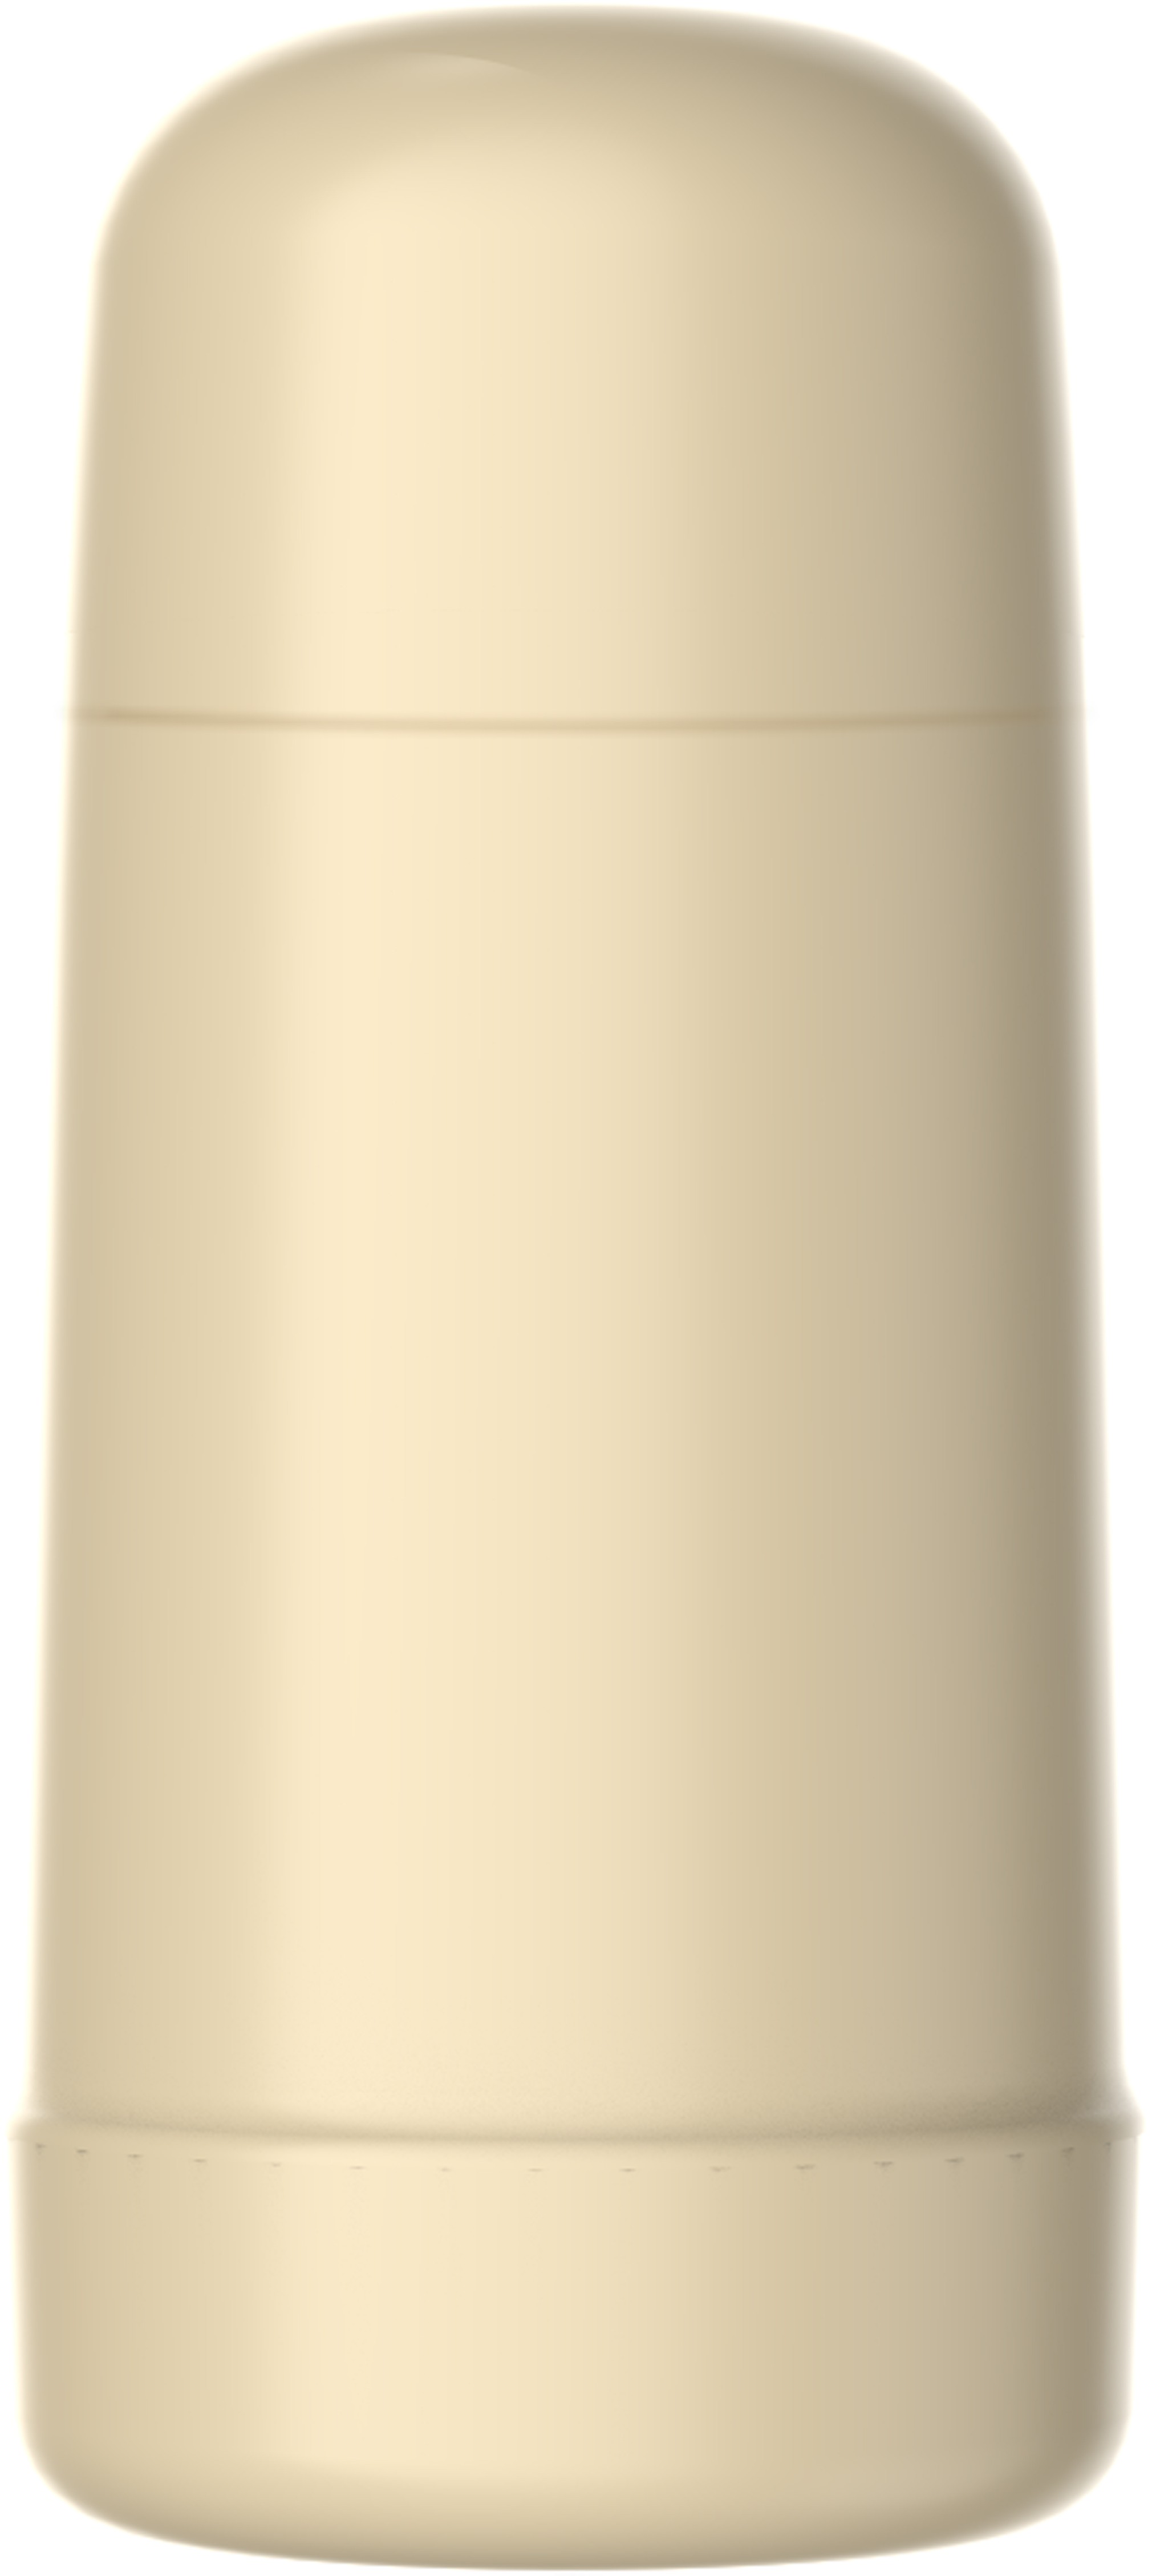 Garrafa Termica Minigarbo Safári 250ml Rolha Clean - Termolar